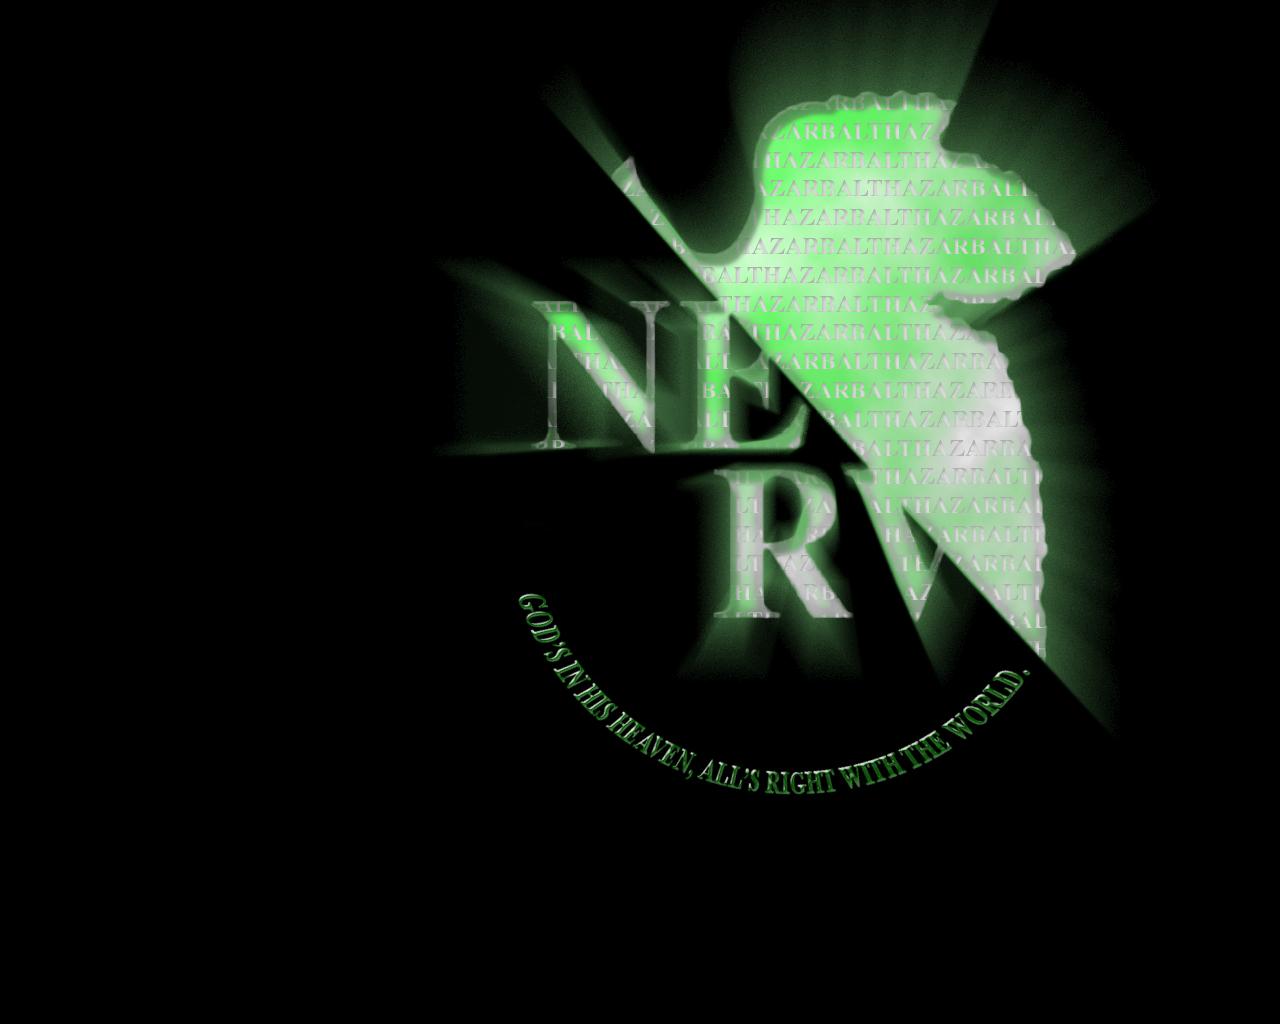 http://1.bp.blogspot.com/-D0pJ2E31bDY/T4hBUTjhEXI/AAAAAAAABMU/-J6_opSt4n4/s1600/evangelion_neon_genesis_nerv_desktop_1280x1024_wallpaper-319503.jpg